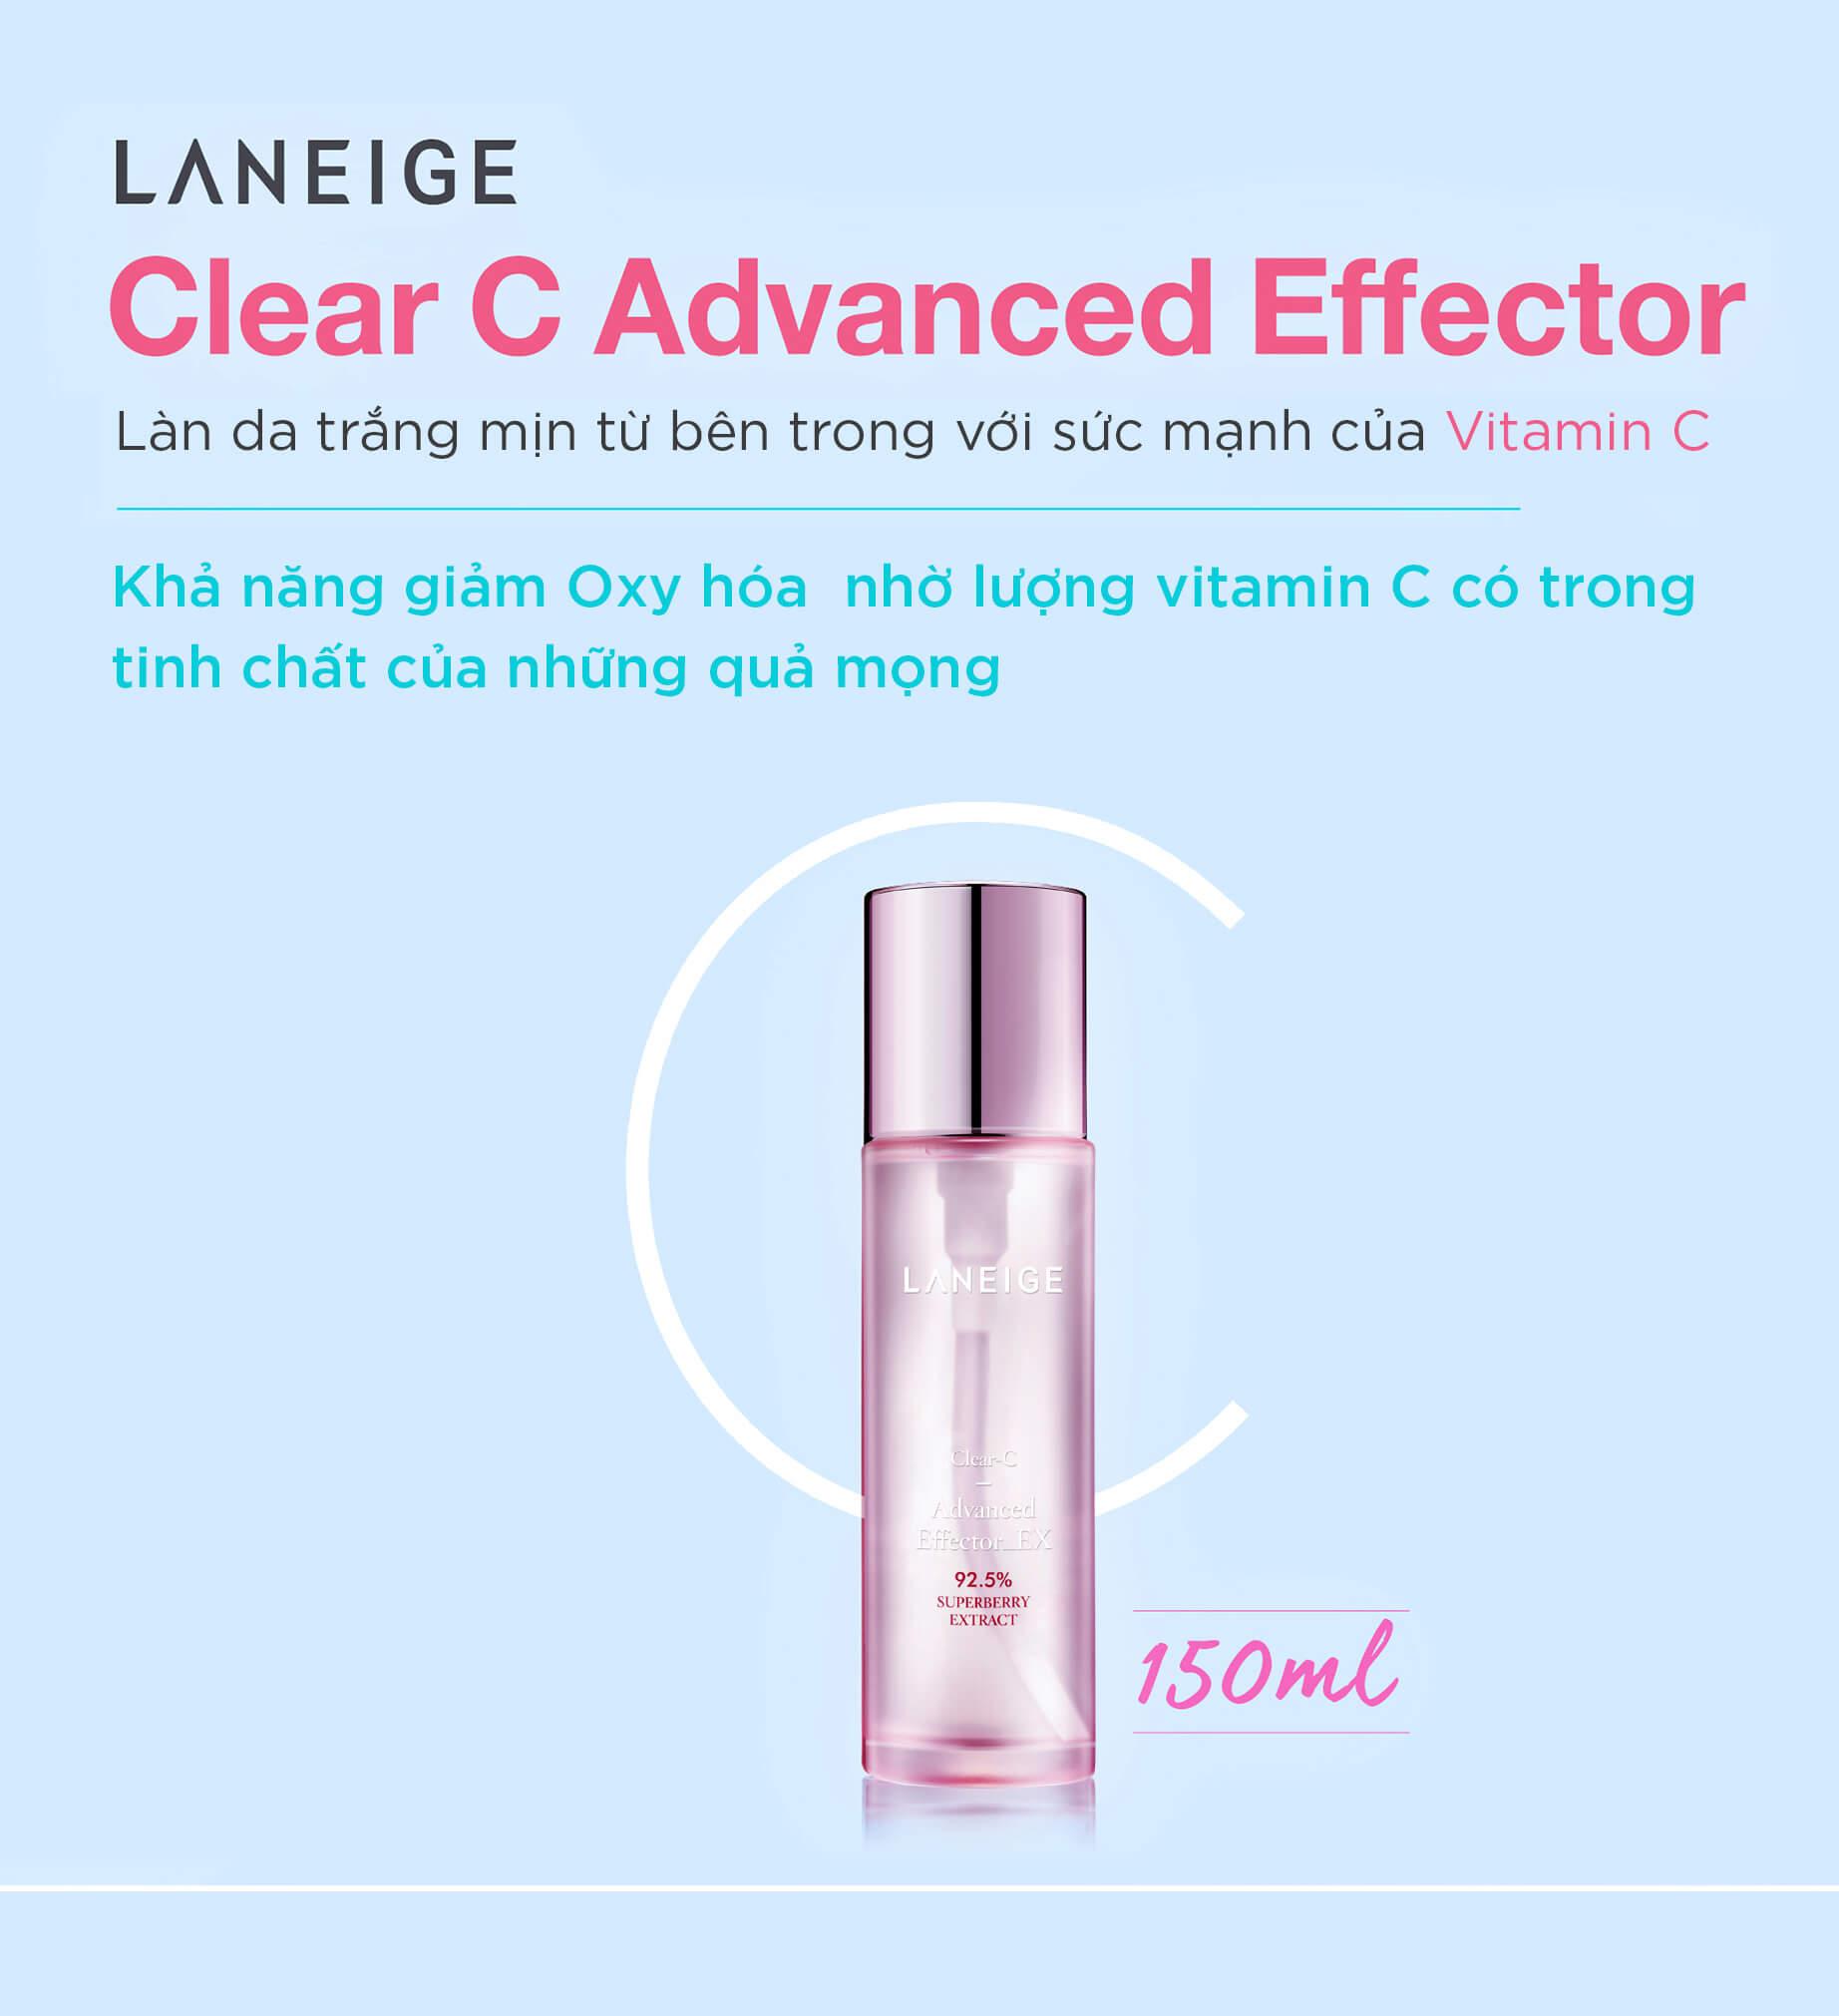 Tinh Chất Bổ Sung Vitamin C Laneige Clear C Advanced Effector EX The Frist Boosting Essence 150ml